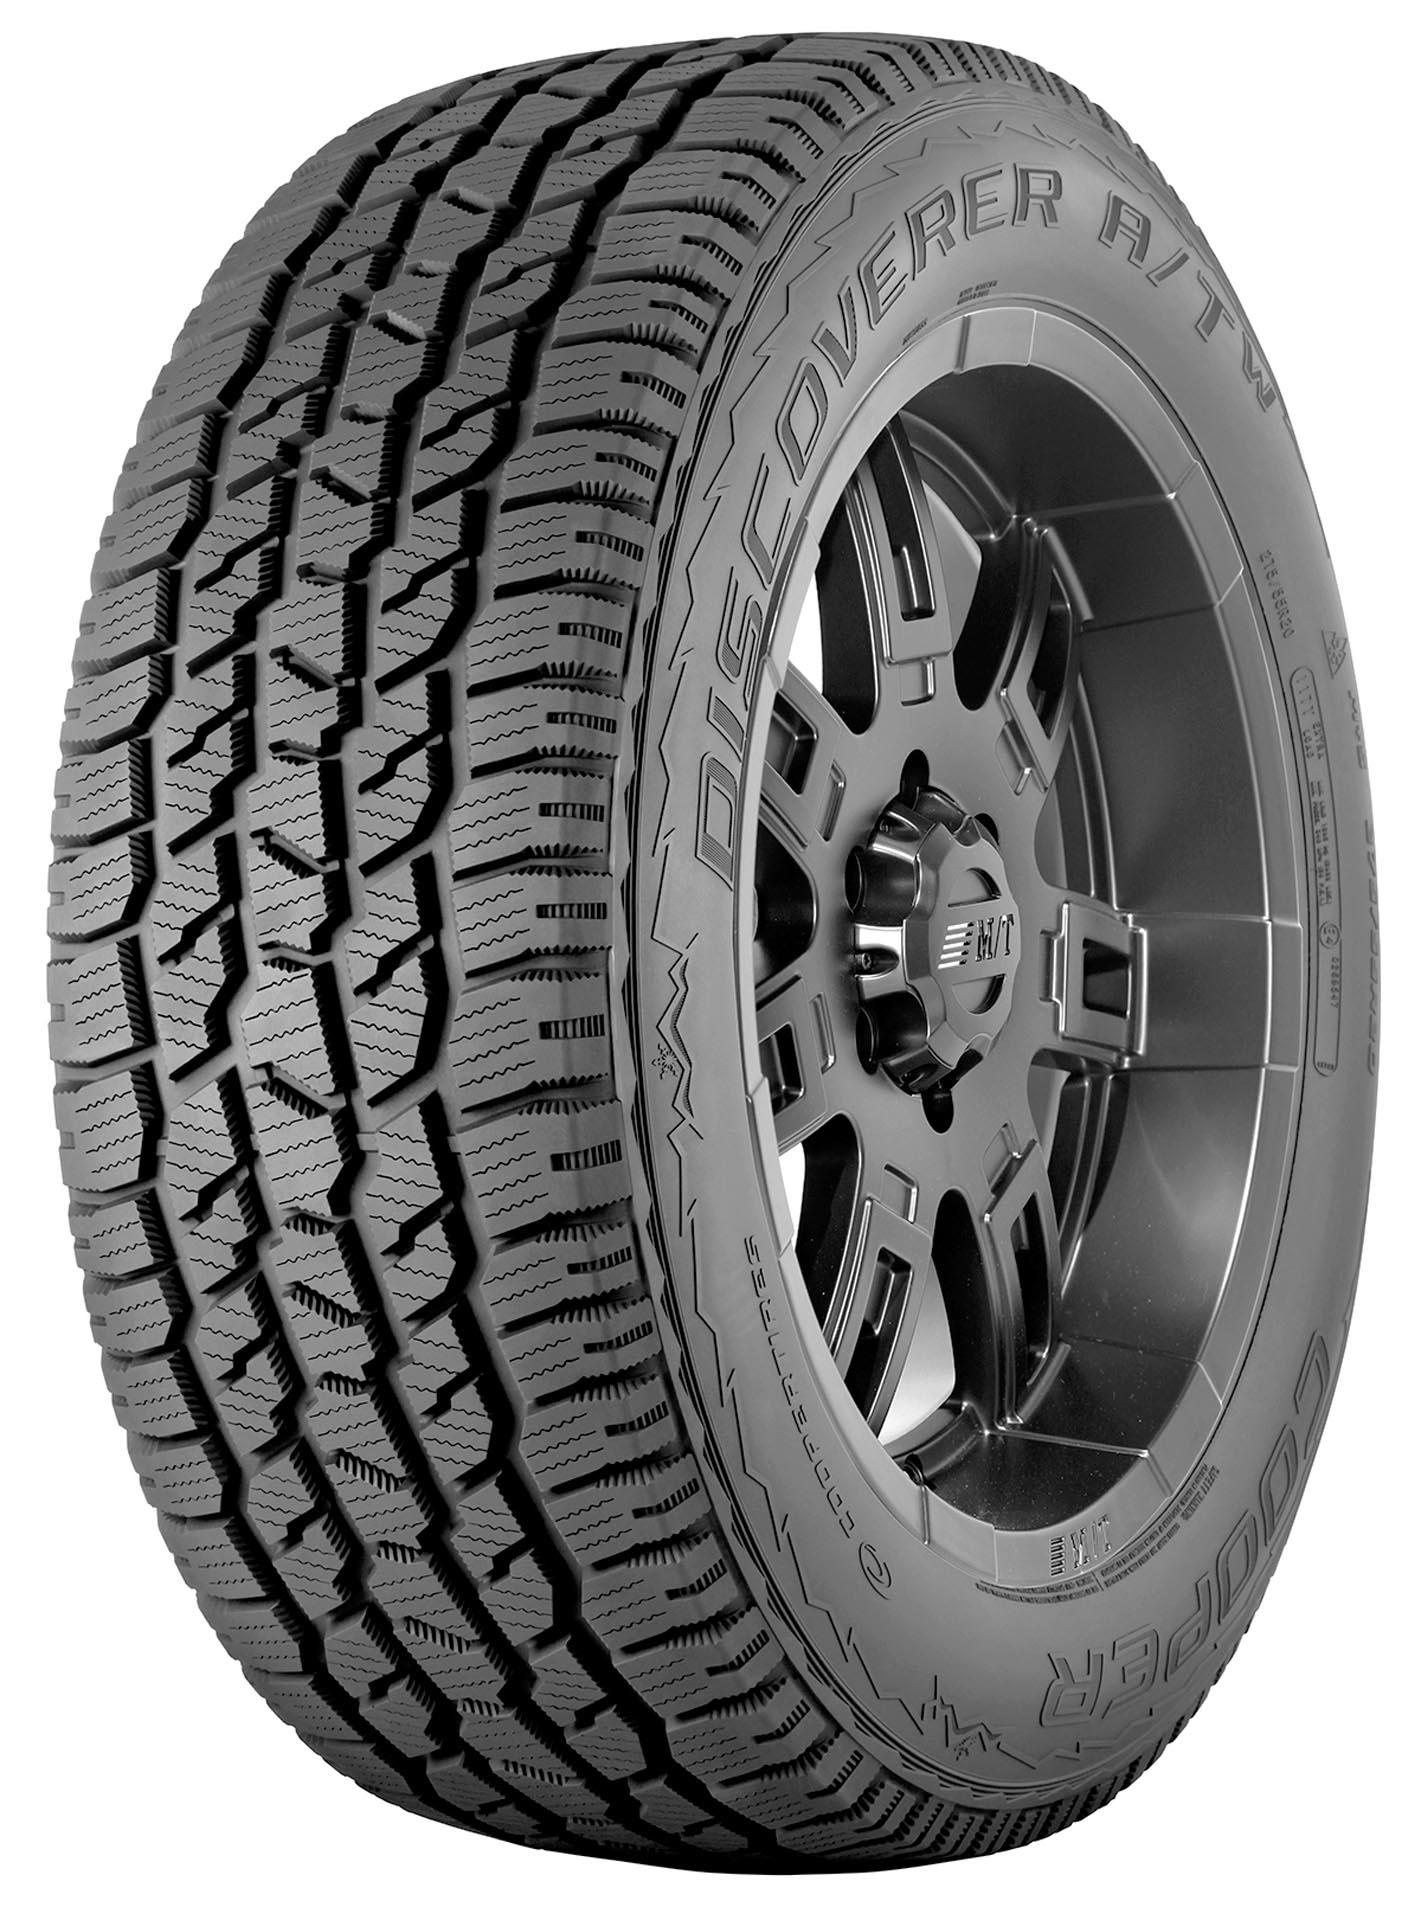 Cooper Discoverer ATW 265/70 R17 | 90000021432 | Custom ...  |Cooper Atw Tires